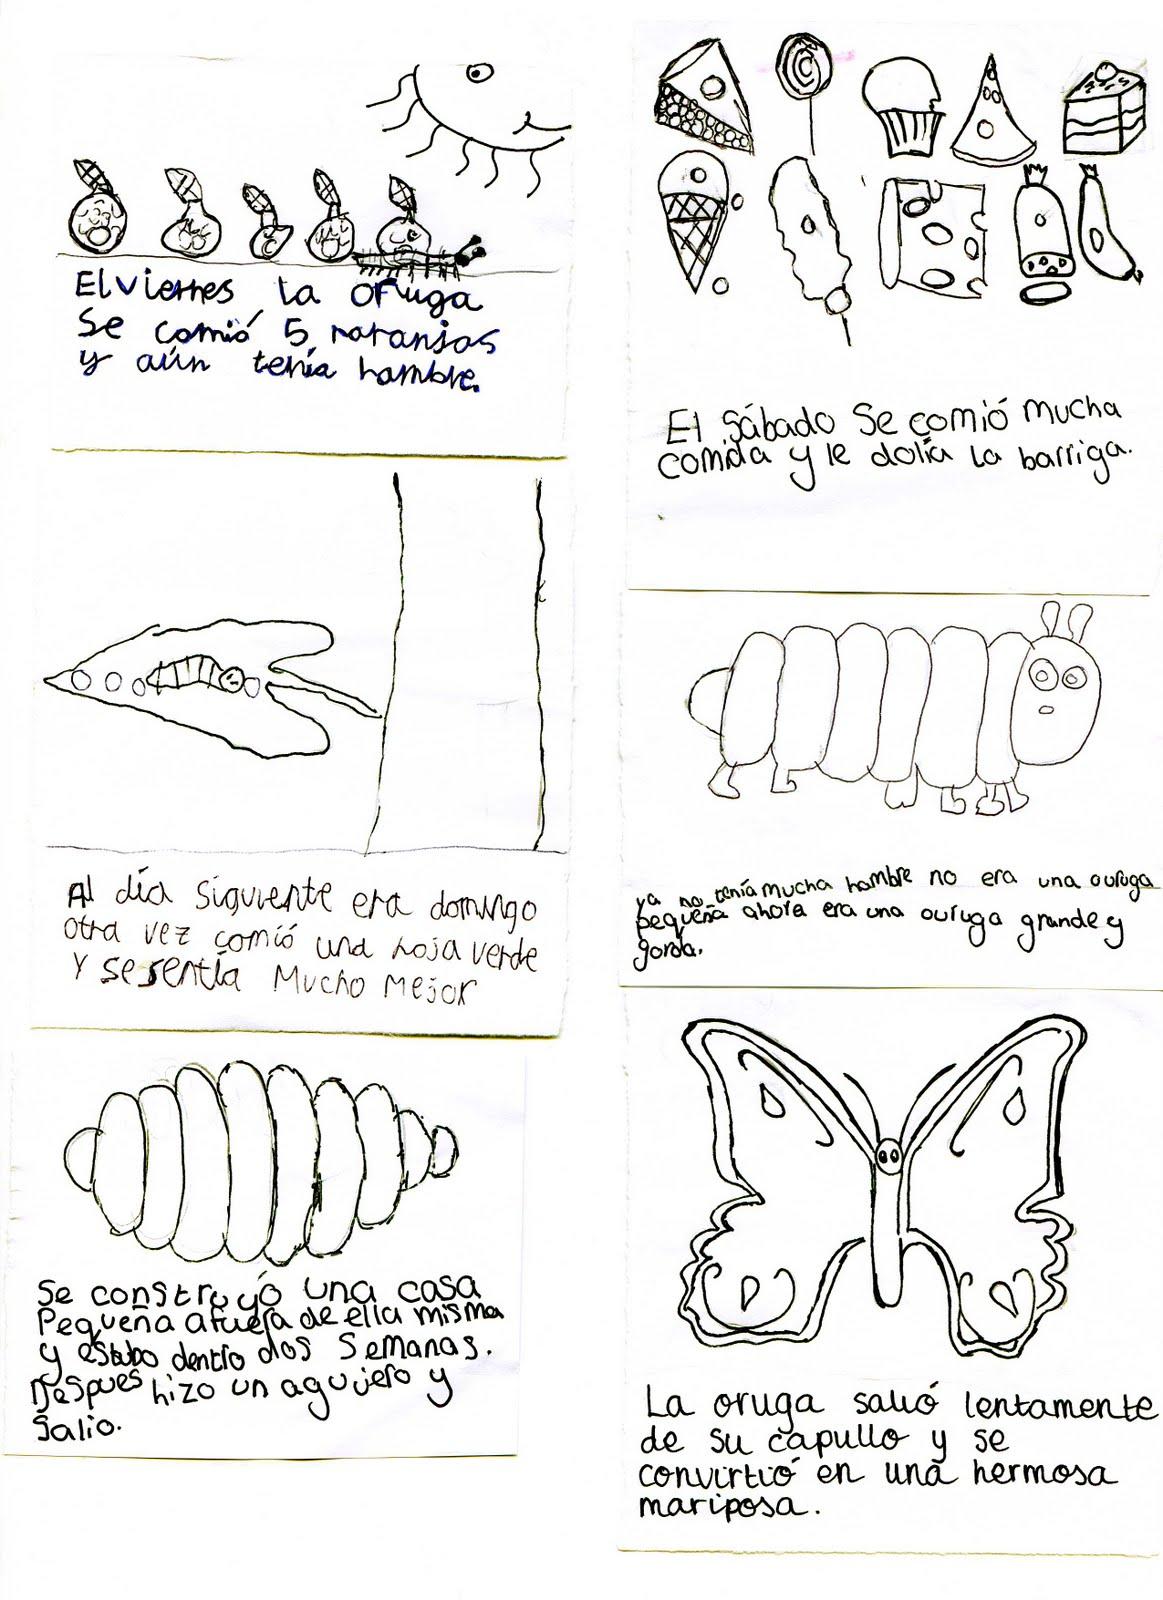 Ainara en clases de anatomia - 1 8